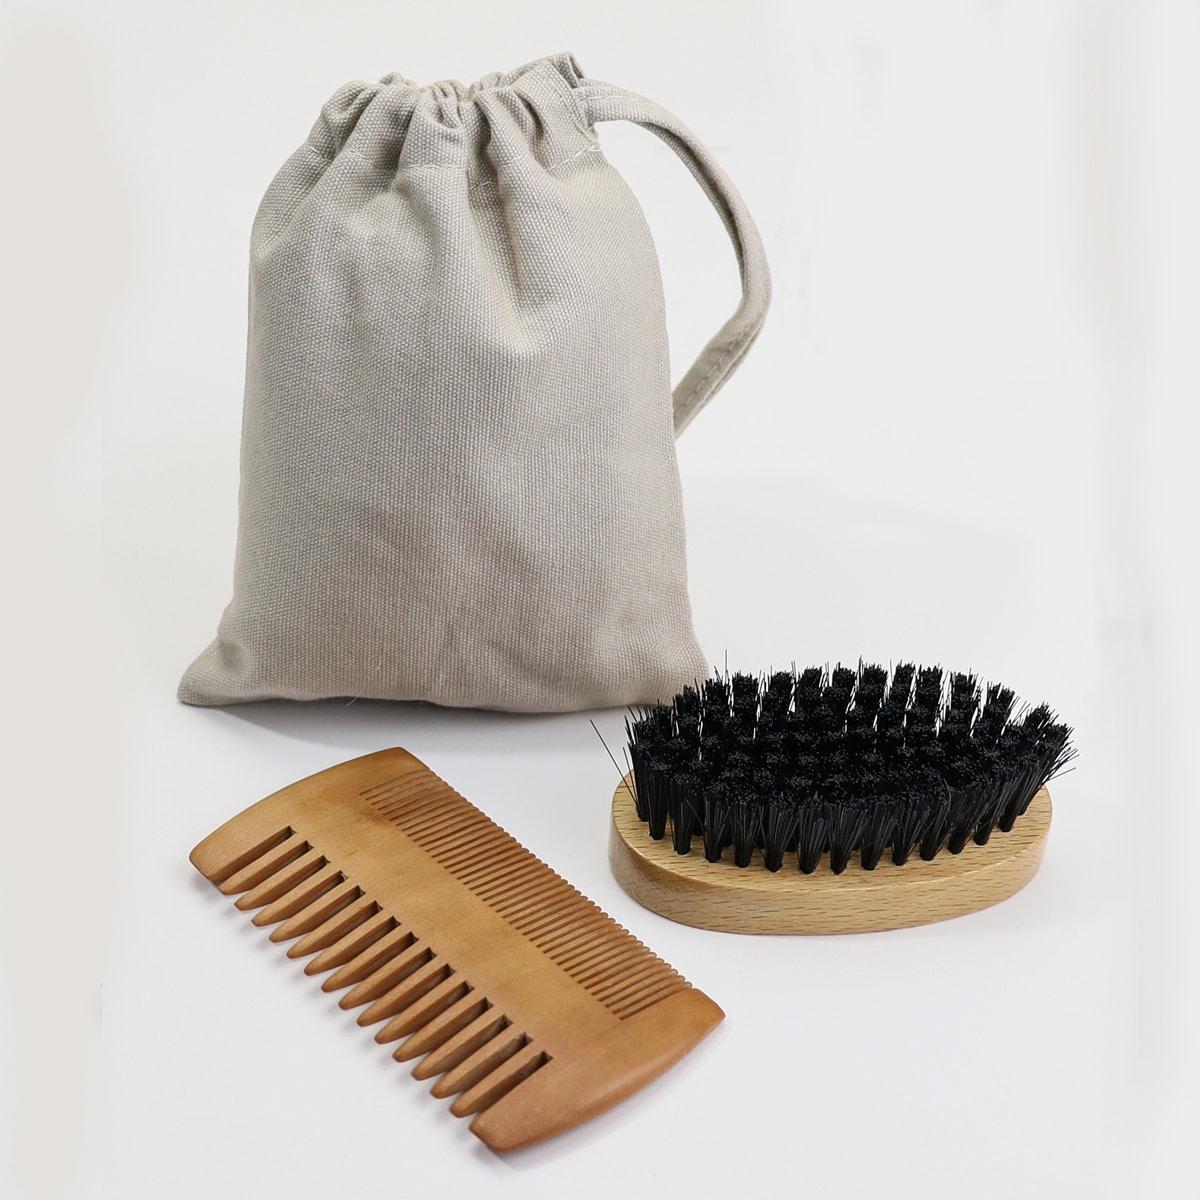 1pc Beard Brush & 1pc Beard Comb & 1pc Storage Bag